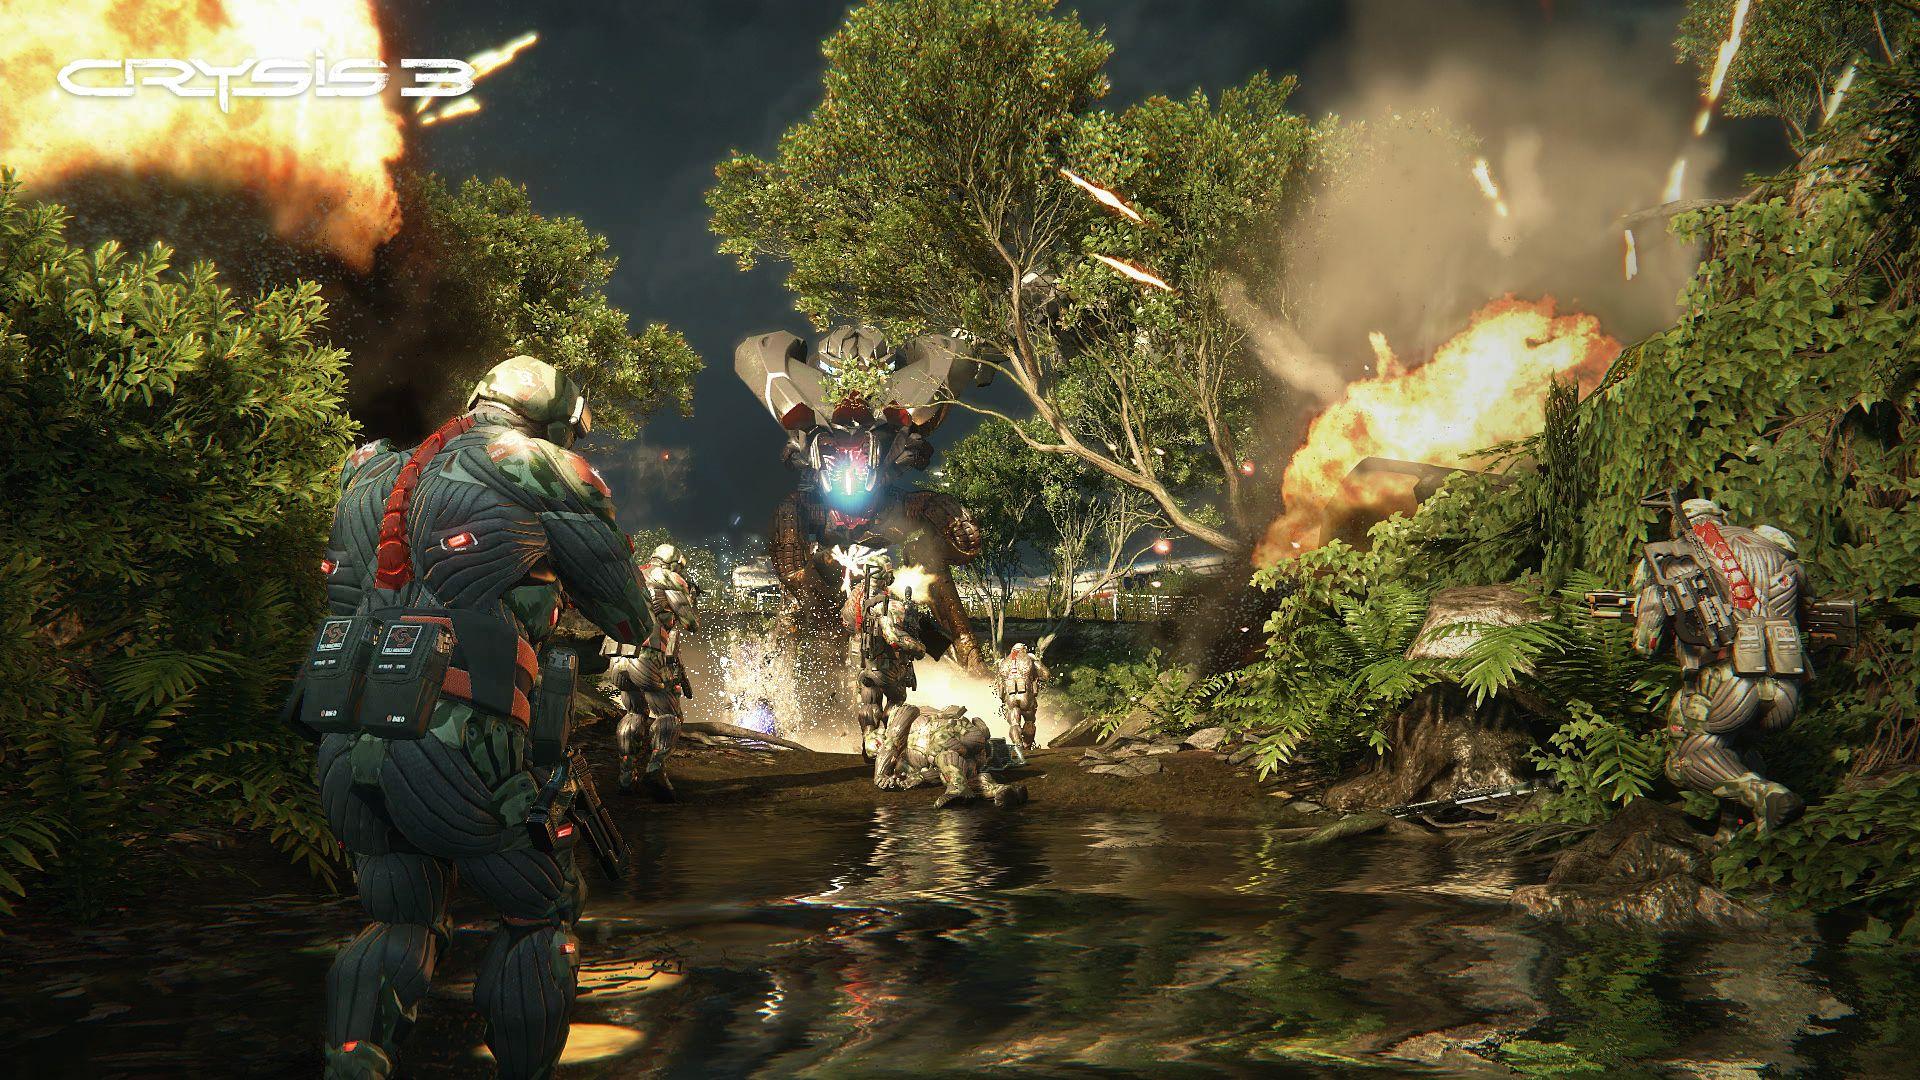 Dojmy z multiplayerové bety Crysis 3 74366